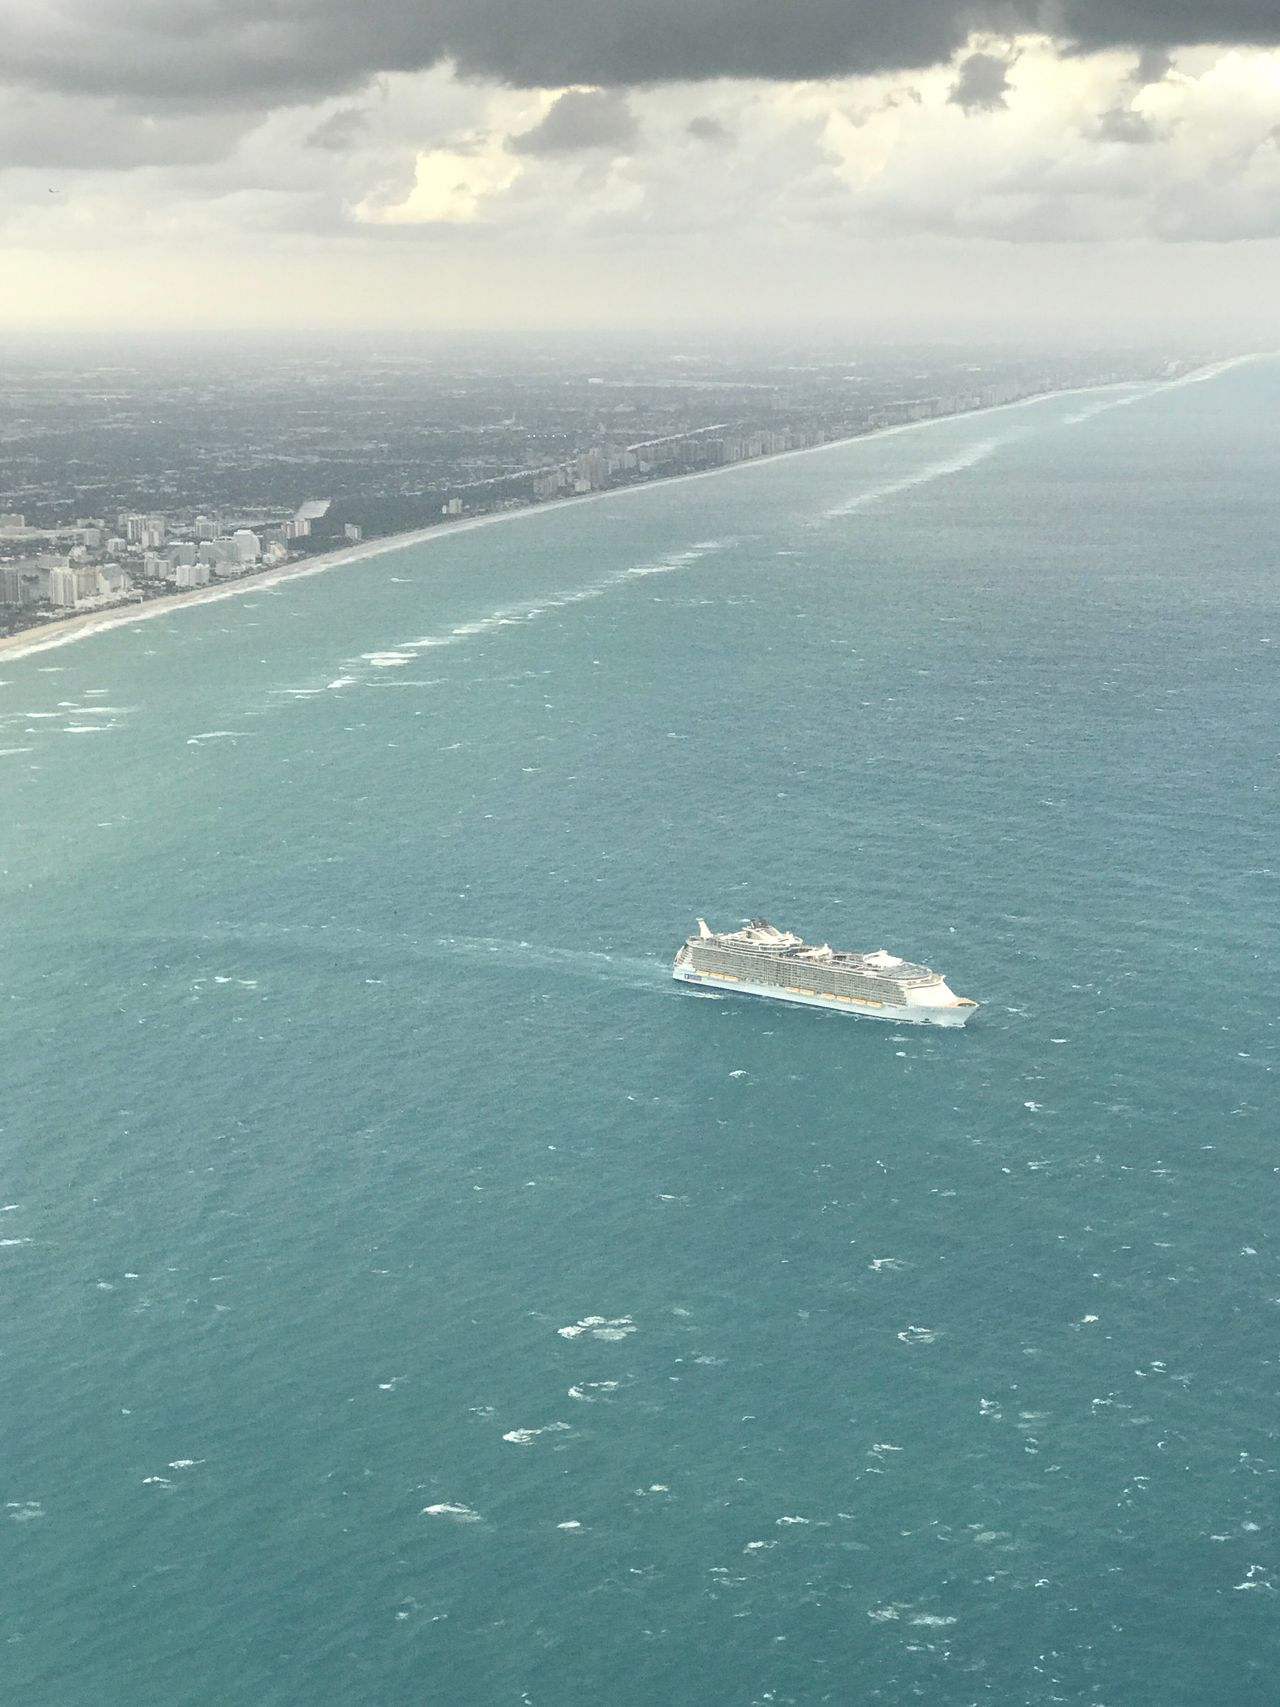 Cruise ship departing Port Everglades, Florida 4840556 Aerial Photography Beach Sea High Angle View Aerial View Aerial Shot Ocean Cruise Ship Ship Cruise